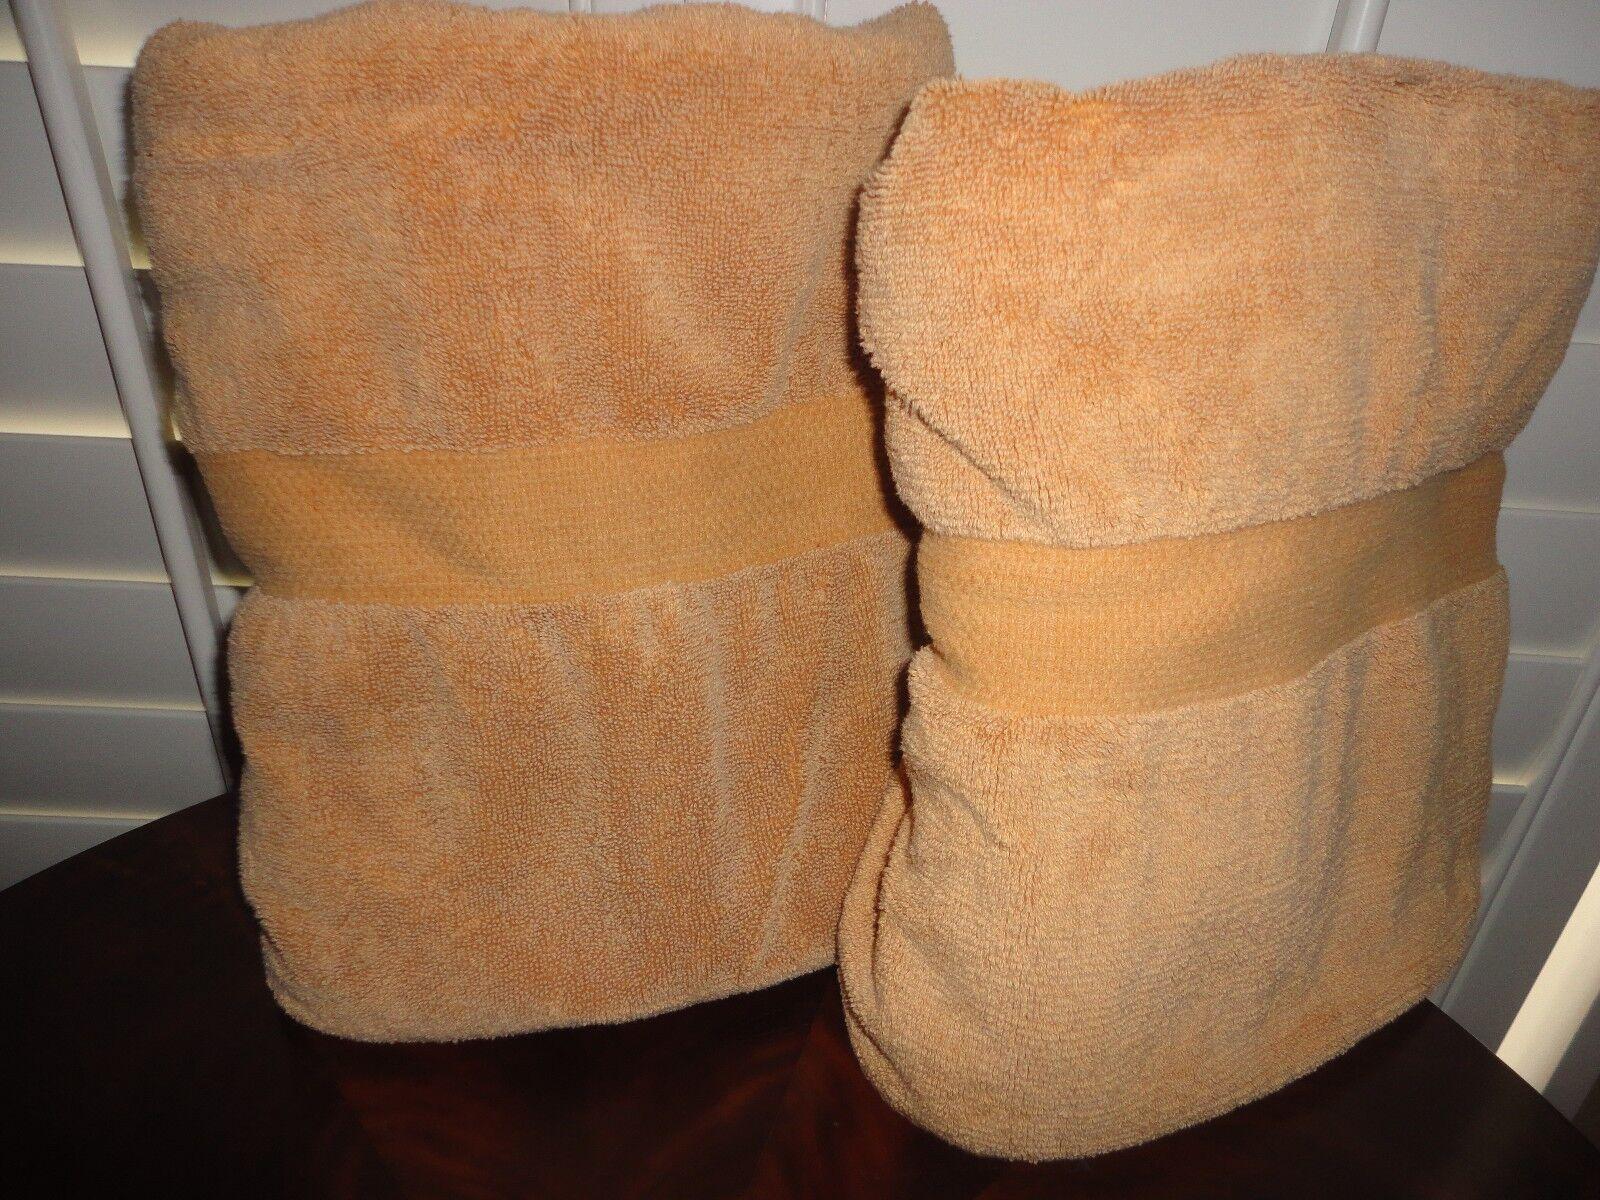 VINTAGE RALPH LAUREN AVENUE HONEY AMBER (2PC) SET BATH TOWELS TOWELS TOWELS 28 X 48 aeee15